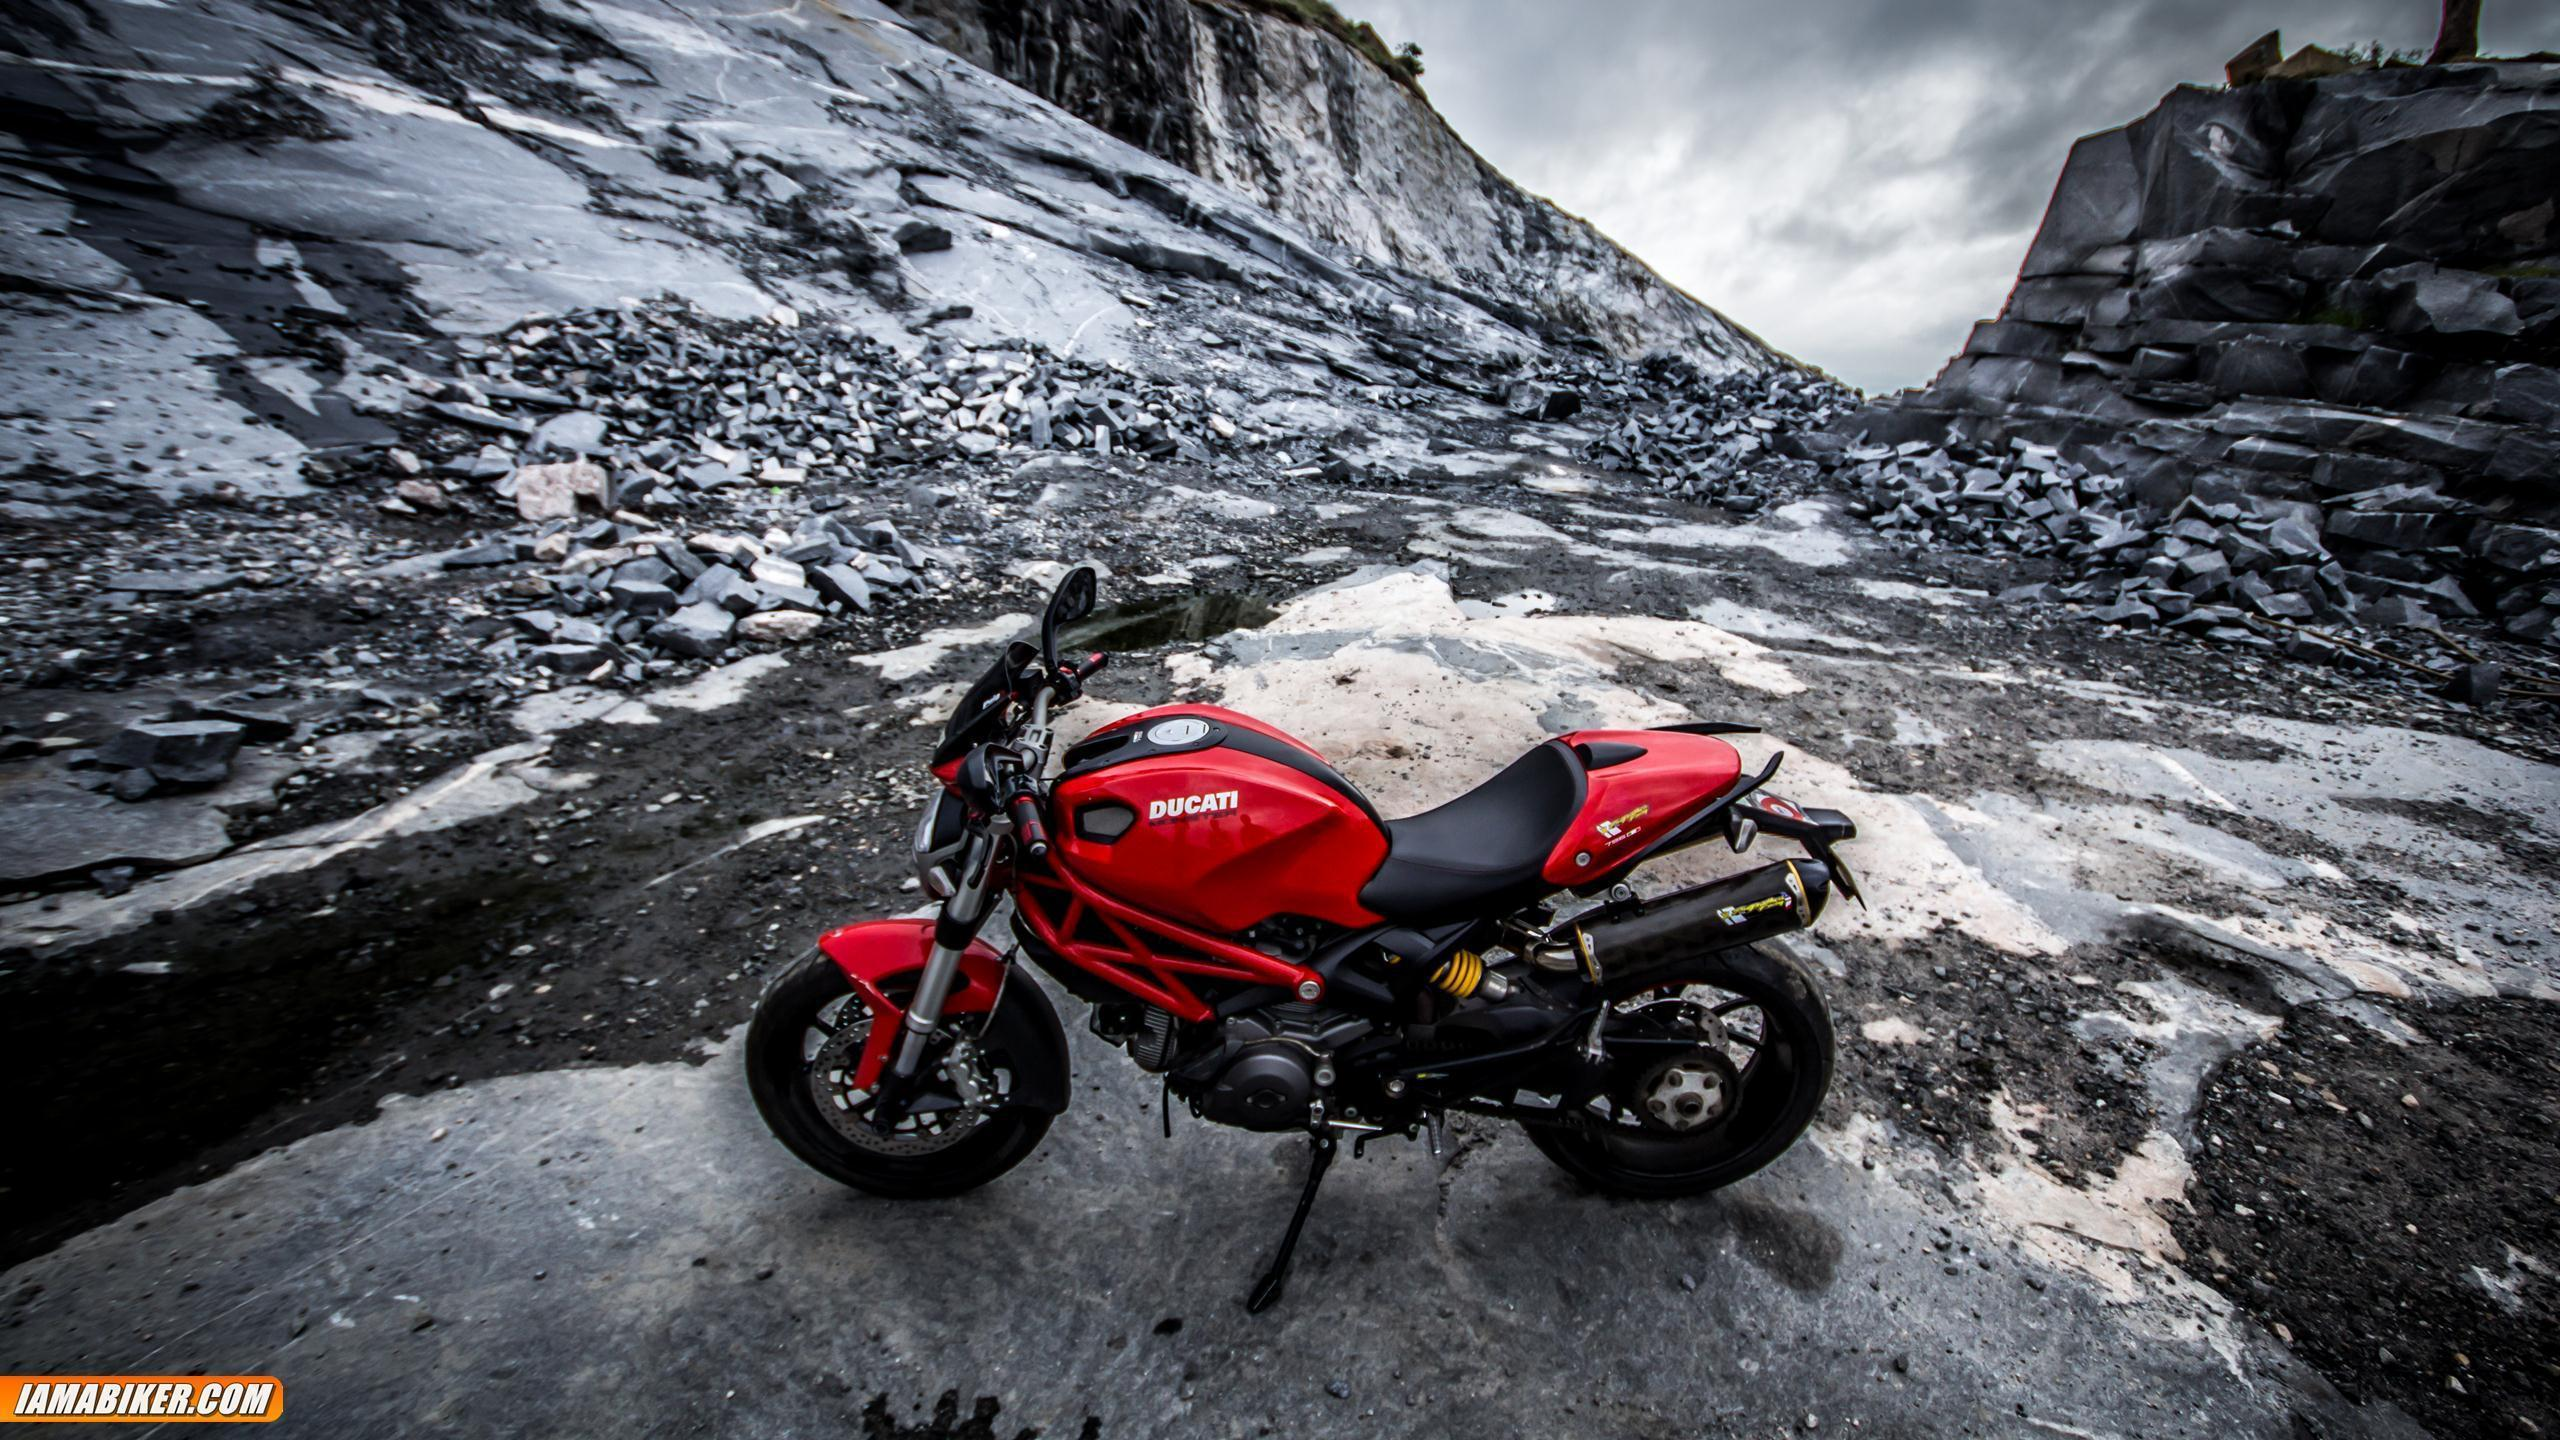 Ducati  Screensaver